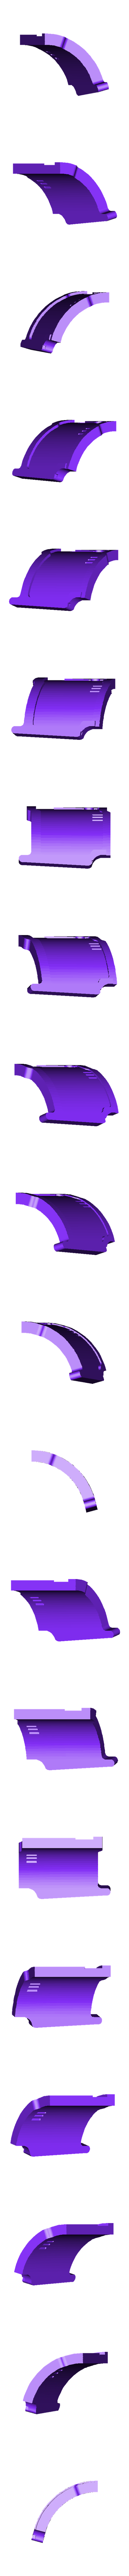 Leg_armor_-_Right.stl Download free STL file Imperial Crusader Mech - New Legs • 3D printable model, GarinC3D